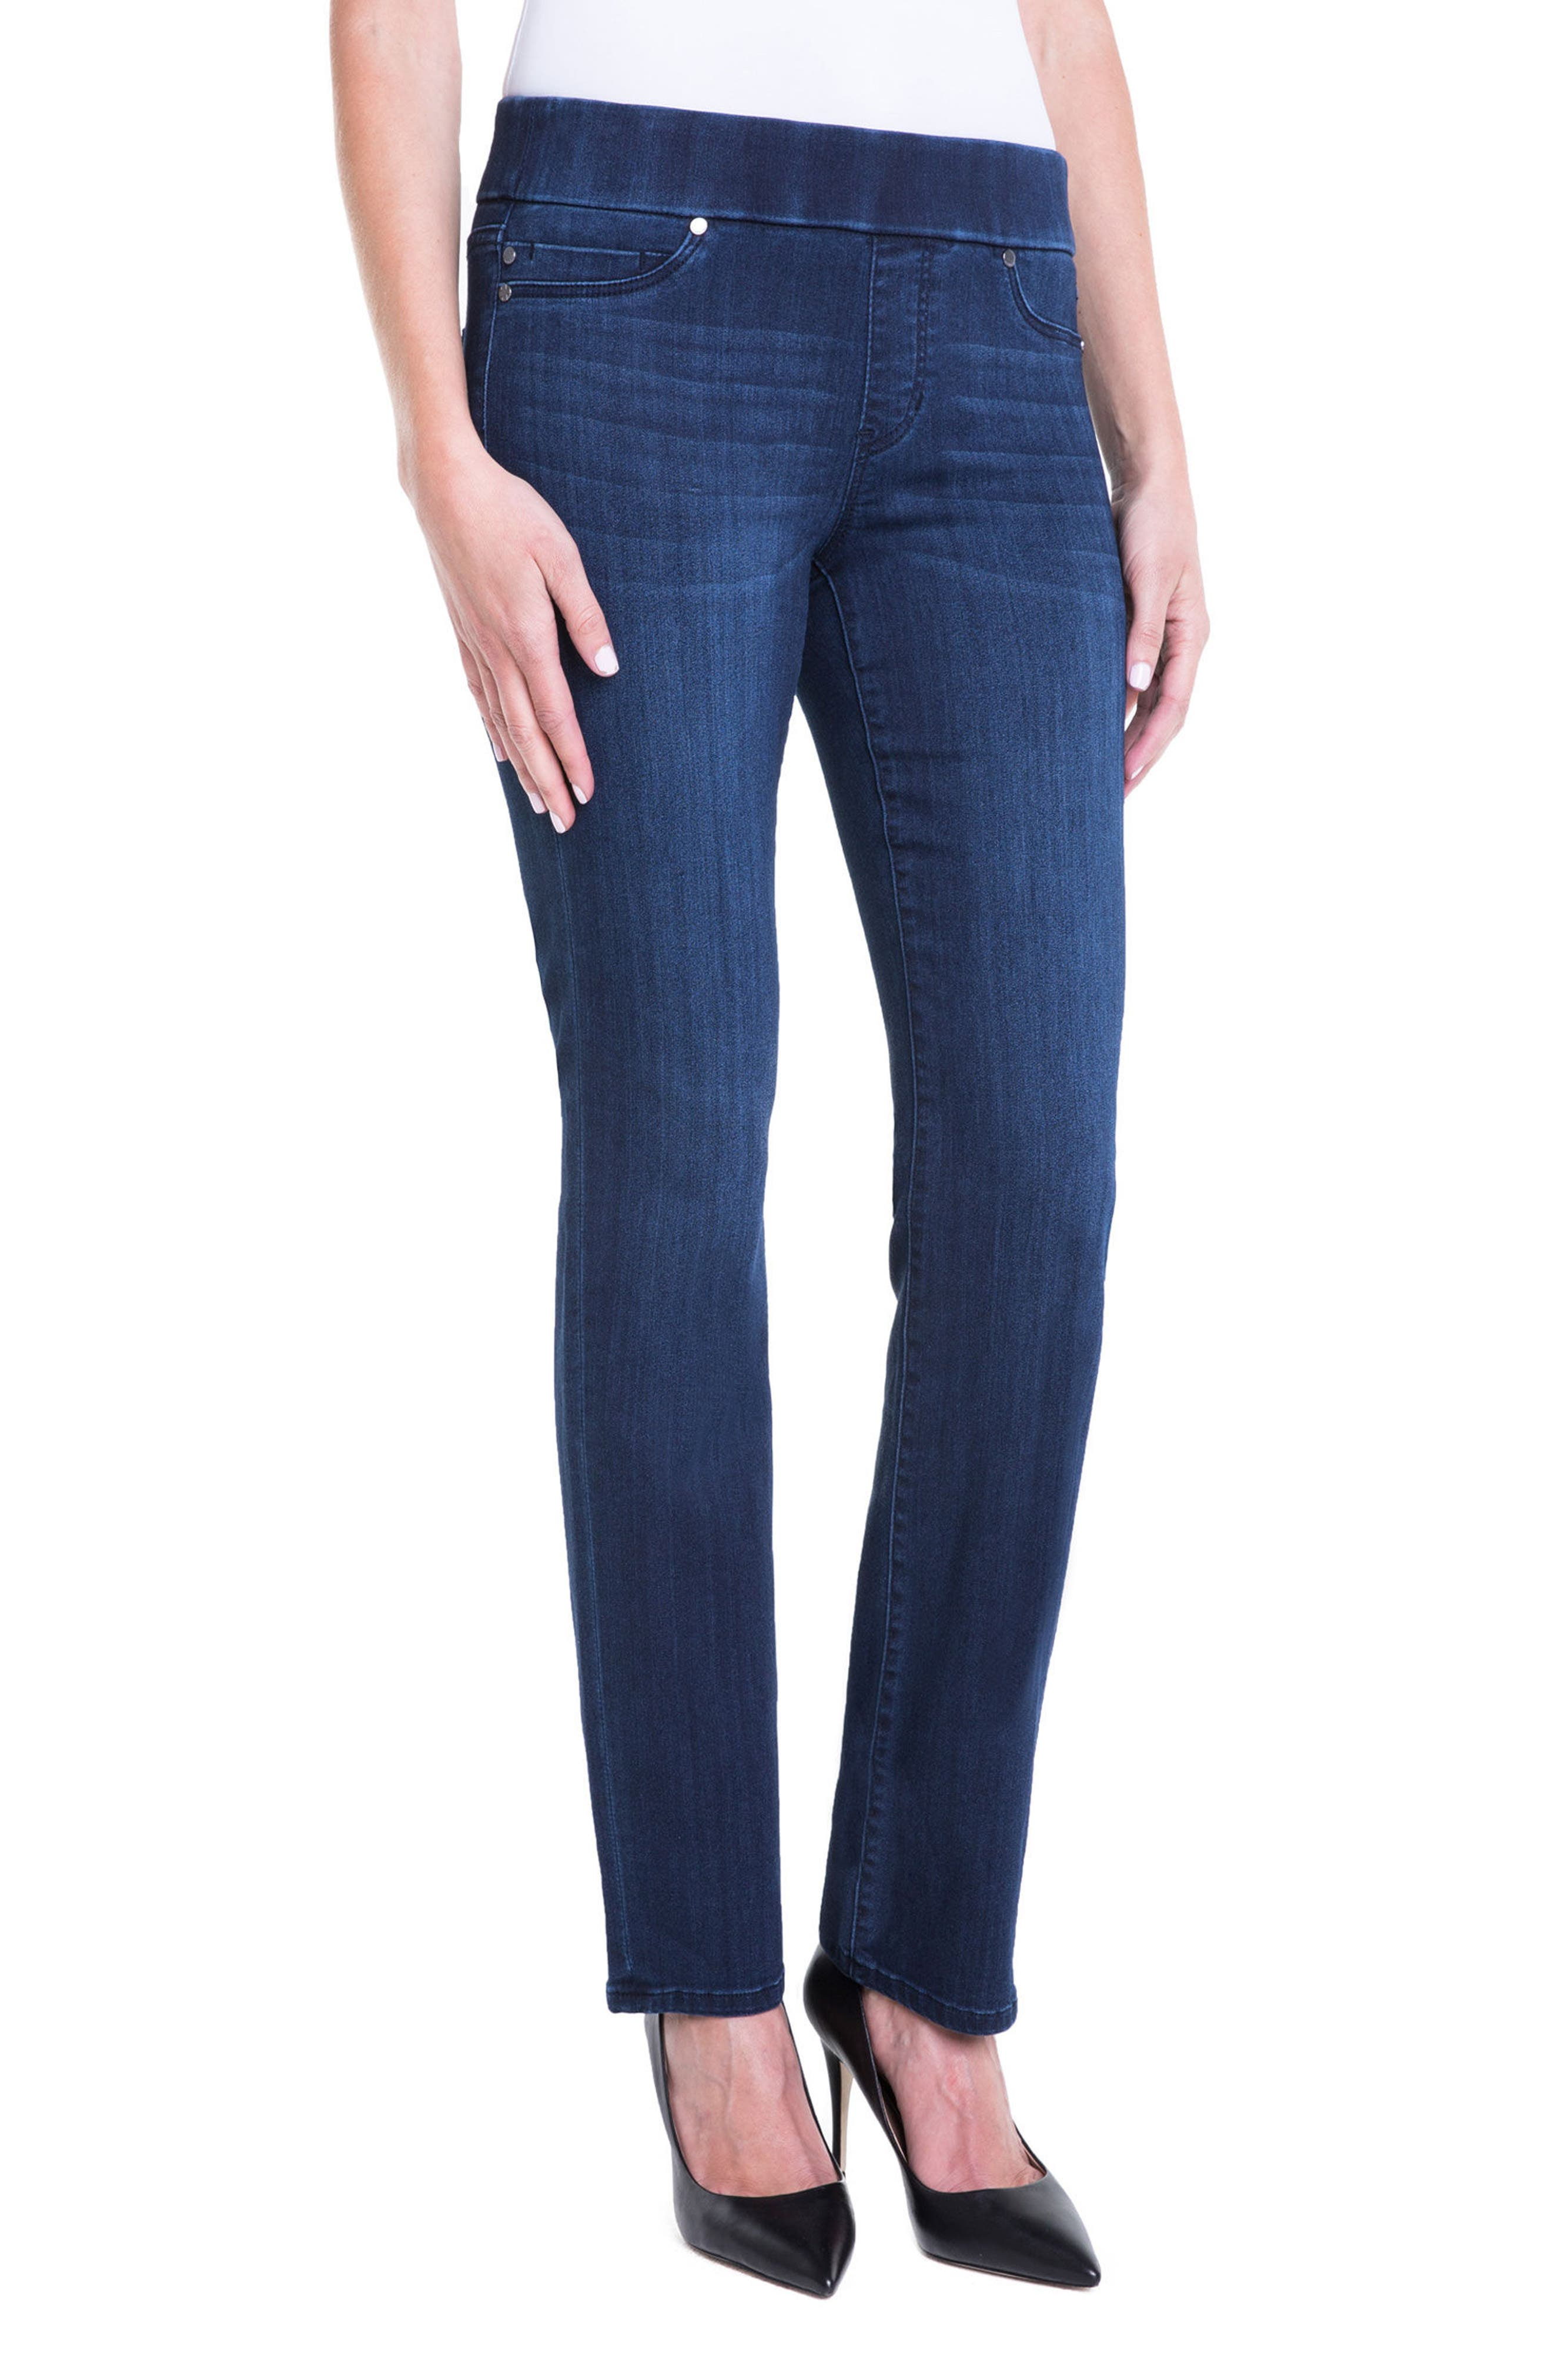 Alternate Image 3  - Liverpool Jeans Company Jillian Pull-On Straight Leg Jeans (Estrella Med Dark)